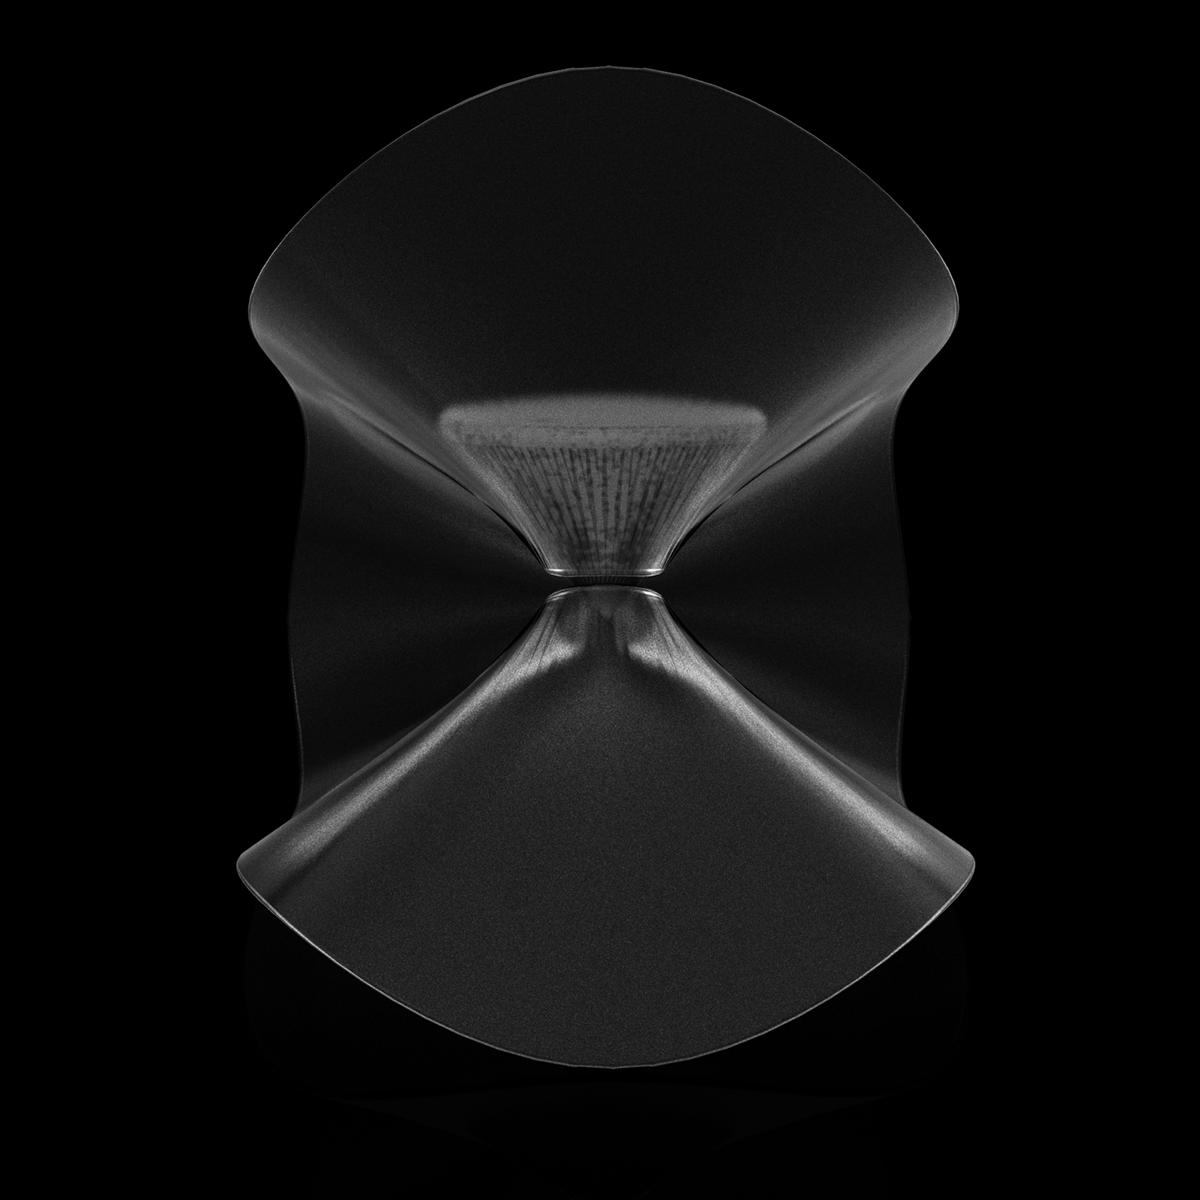 Dicibio innovative armchair innovative chair 2-sided chair darko nikolic design simple armchair minimalist armchair elastic armchair darko nikolic chair chair concept